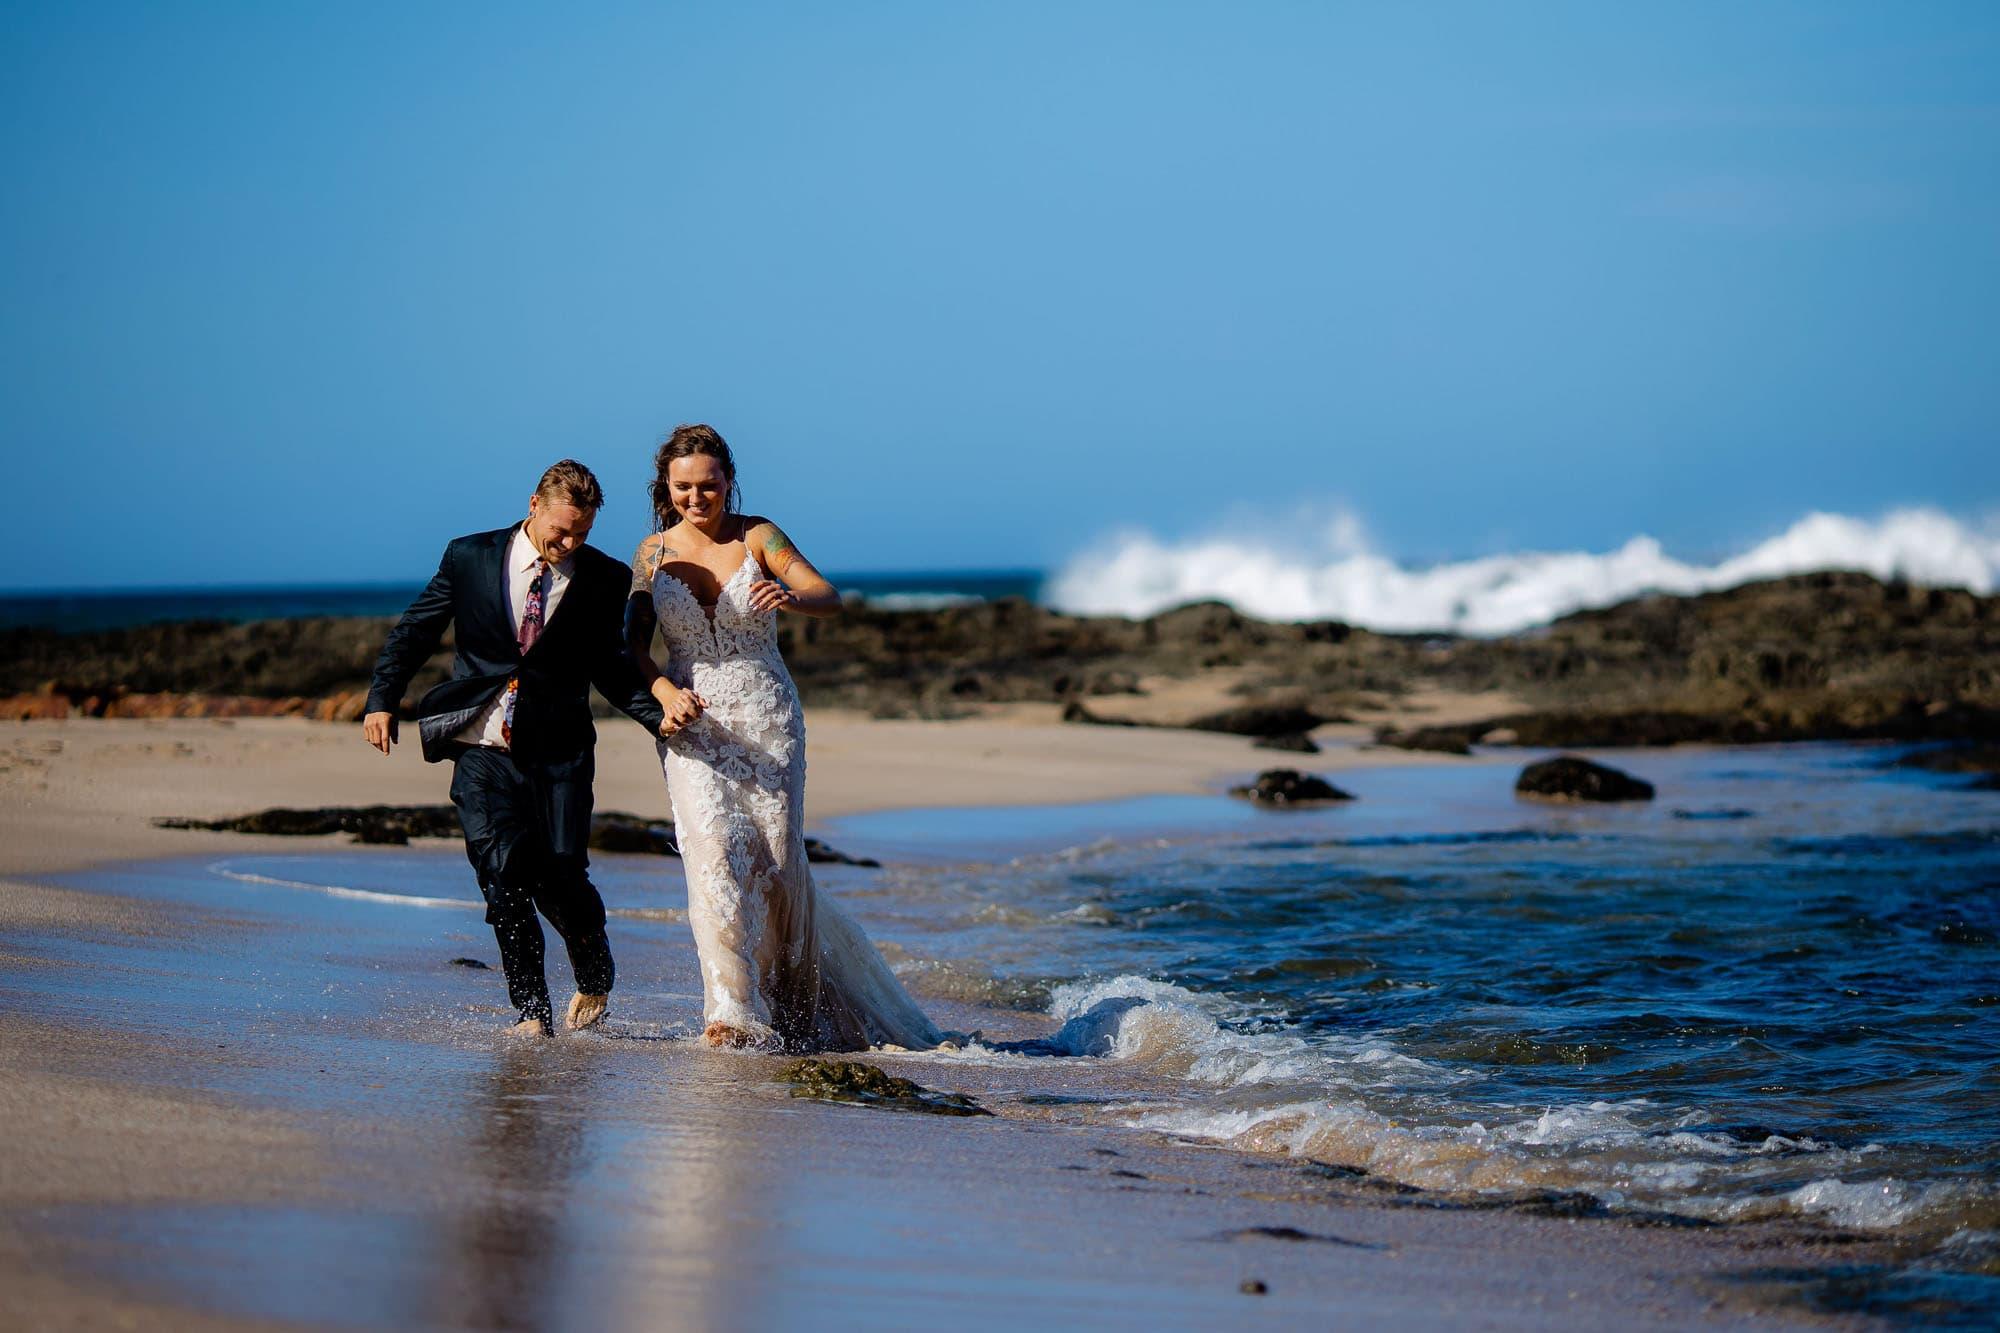 Destination wedding at Playa Langosta Costa Rica.